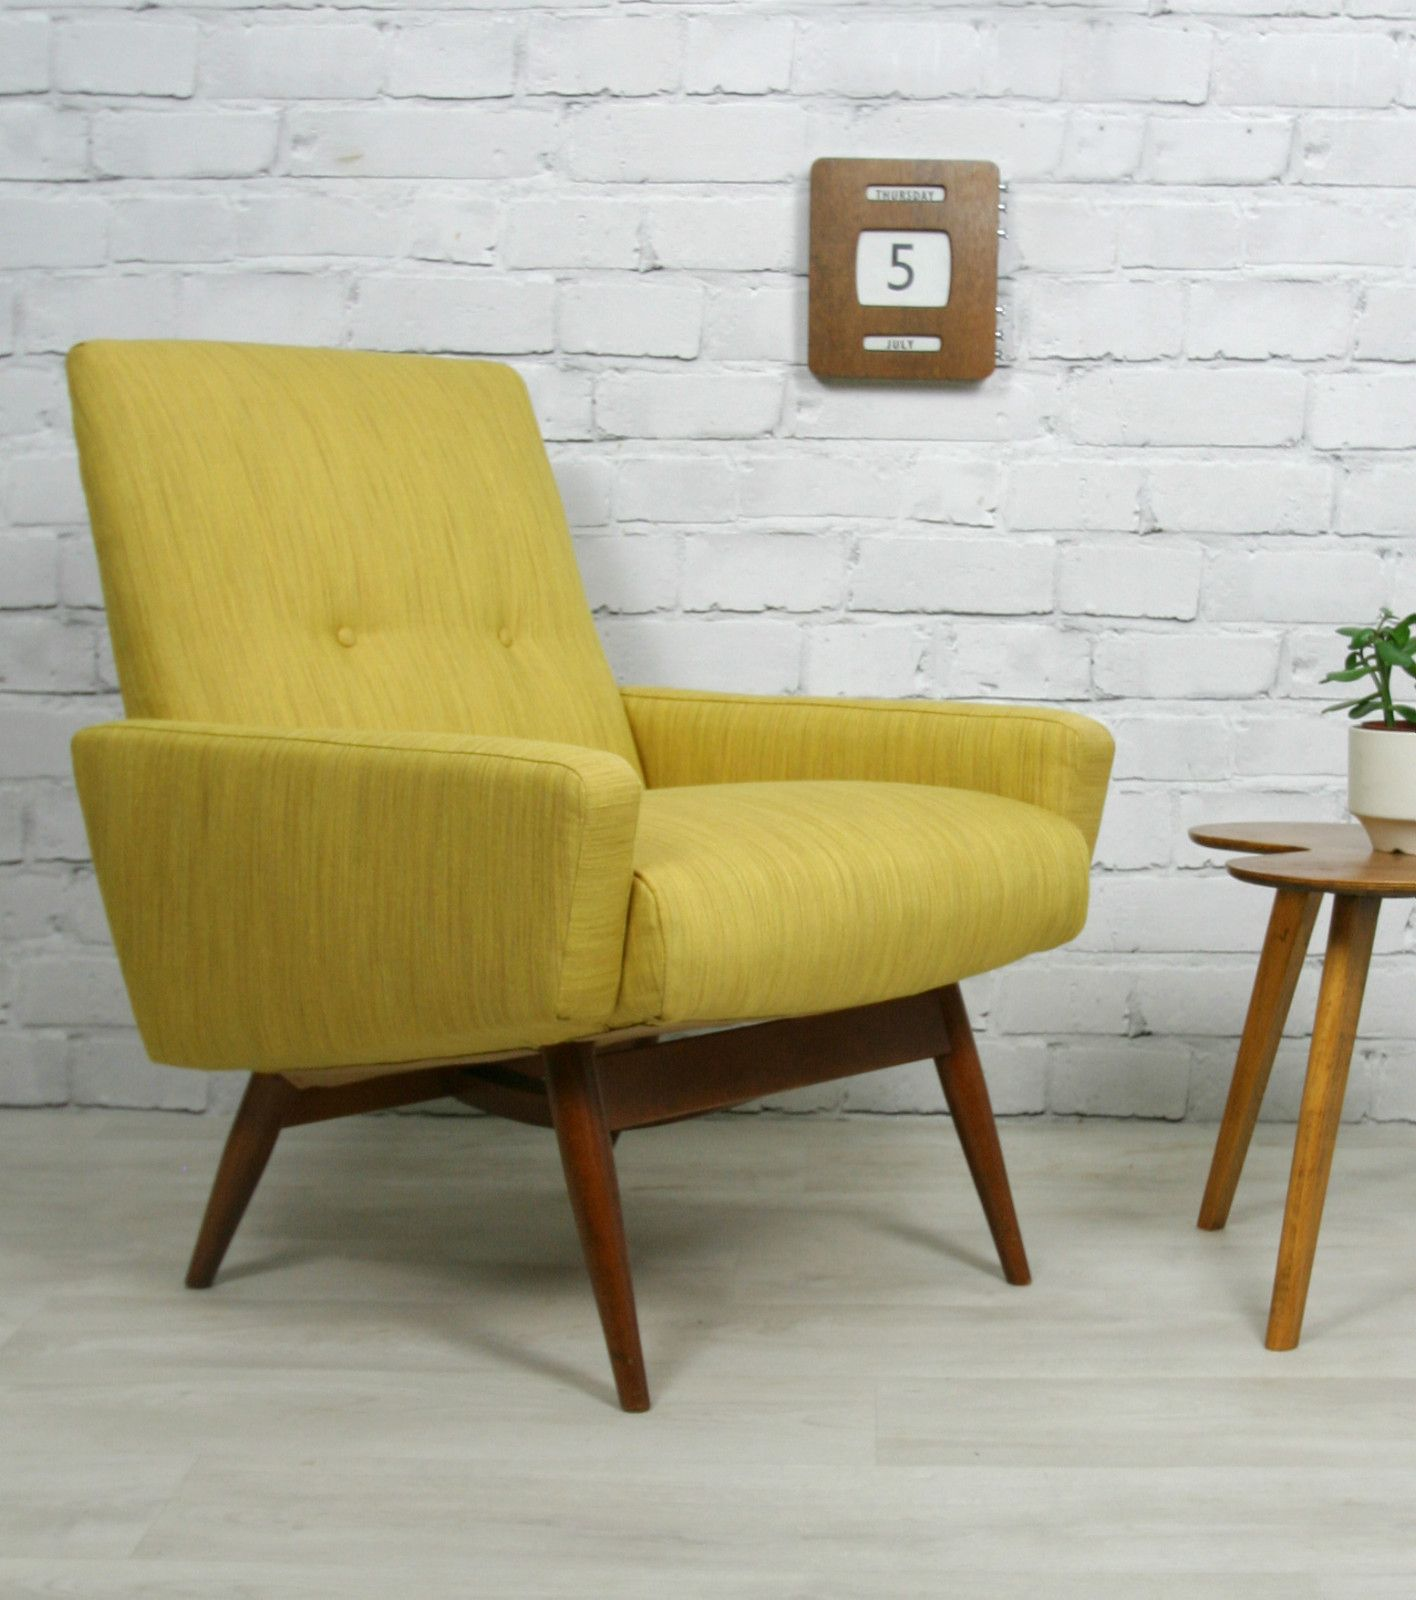 Parker Knoll Vintage Retro Teak Mid Century Danish Style Armchair